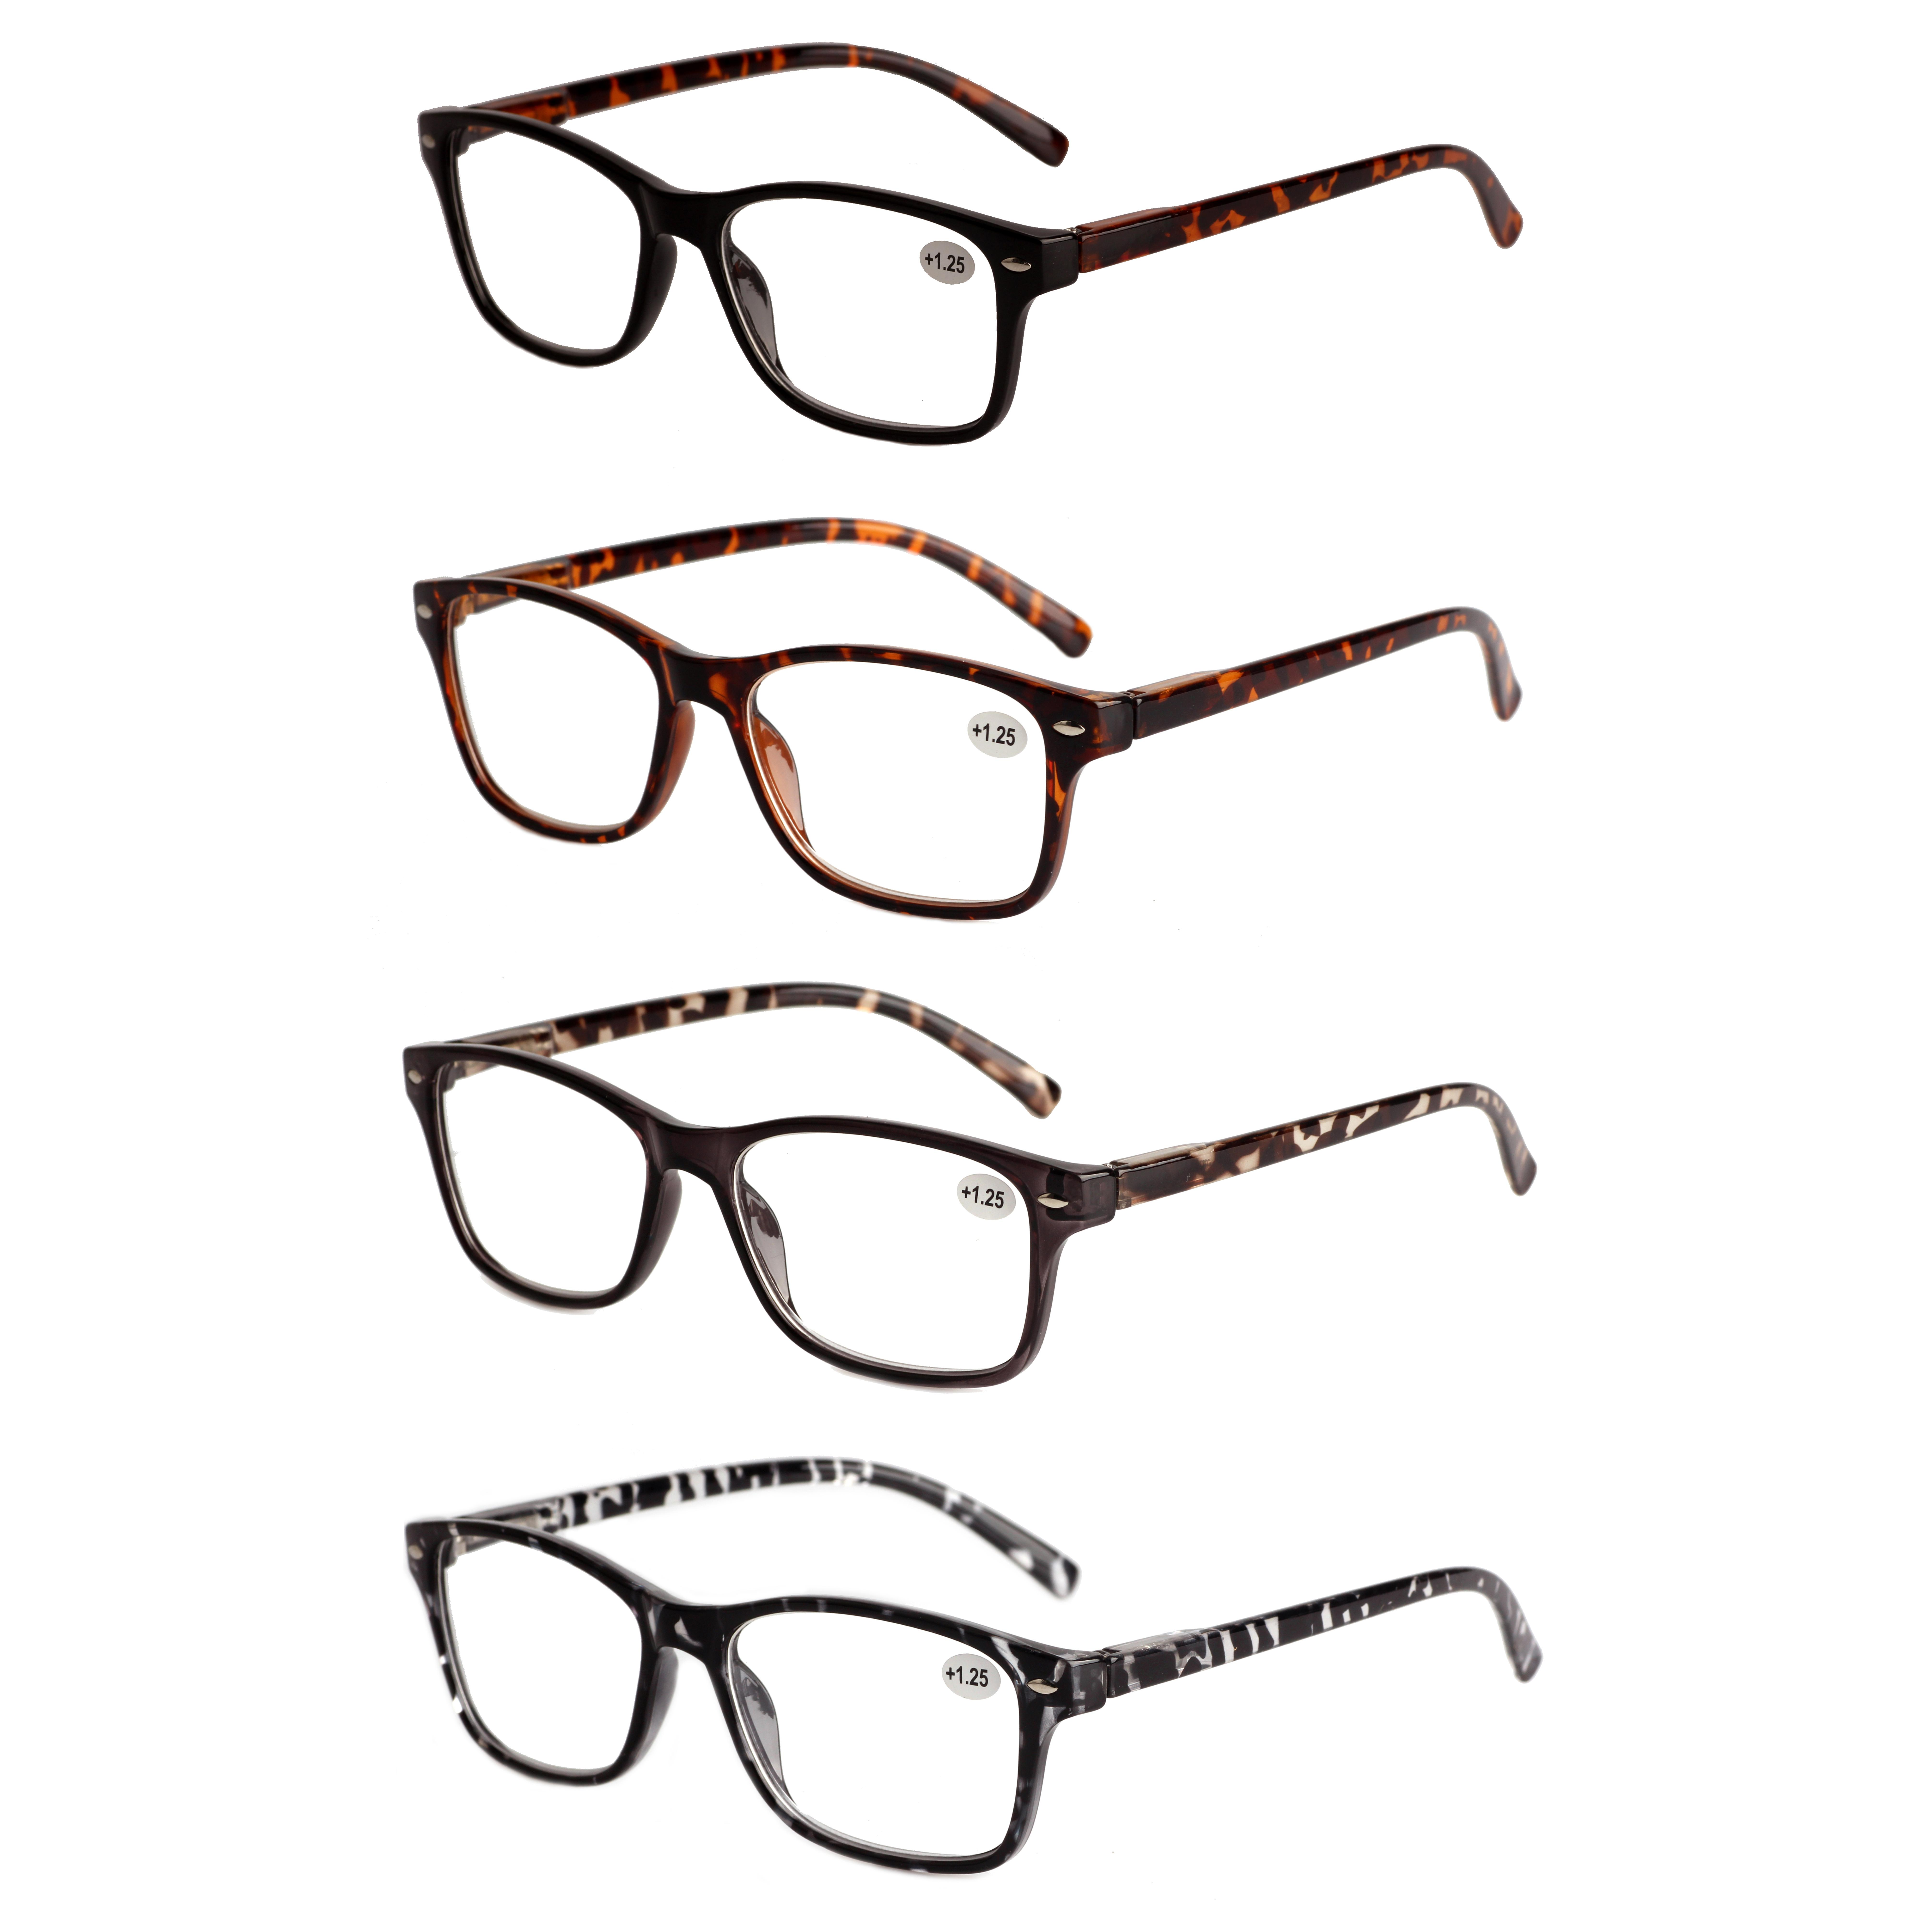 Classic Presbyopic Eyewear Bifocal Reading Glasses With Spring ...